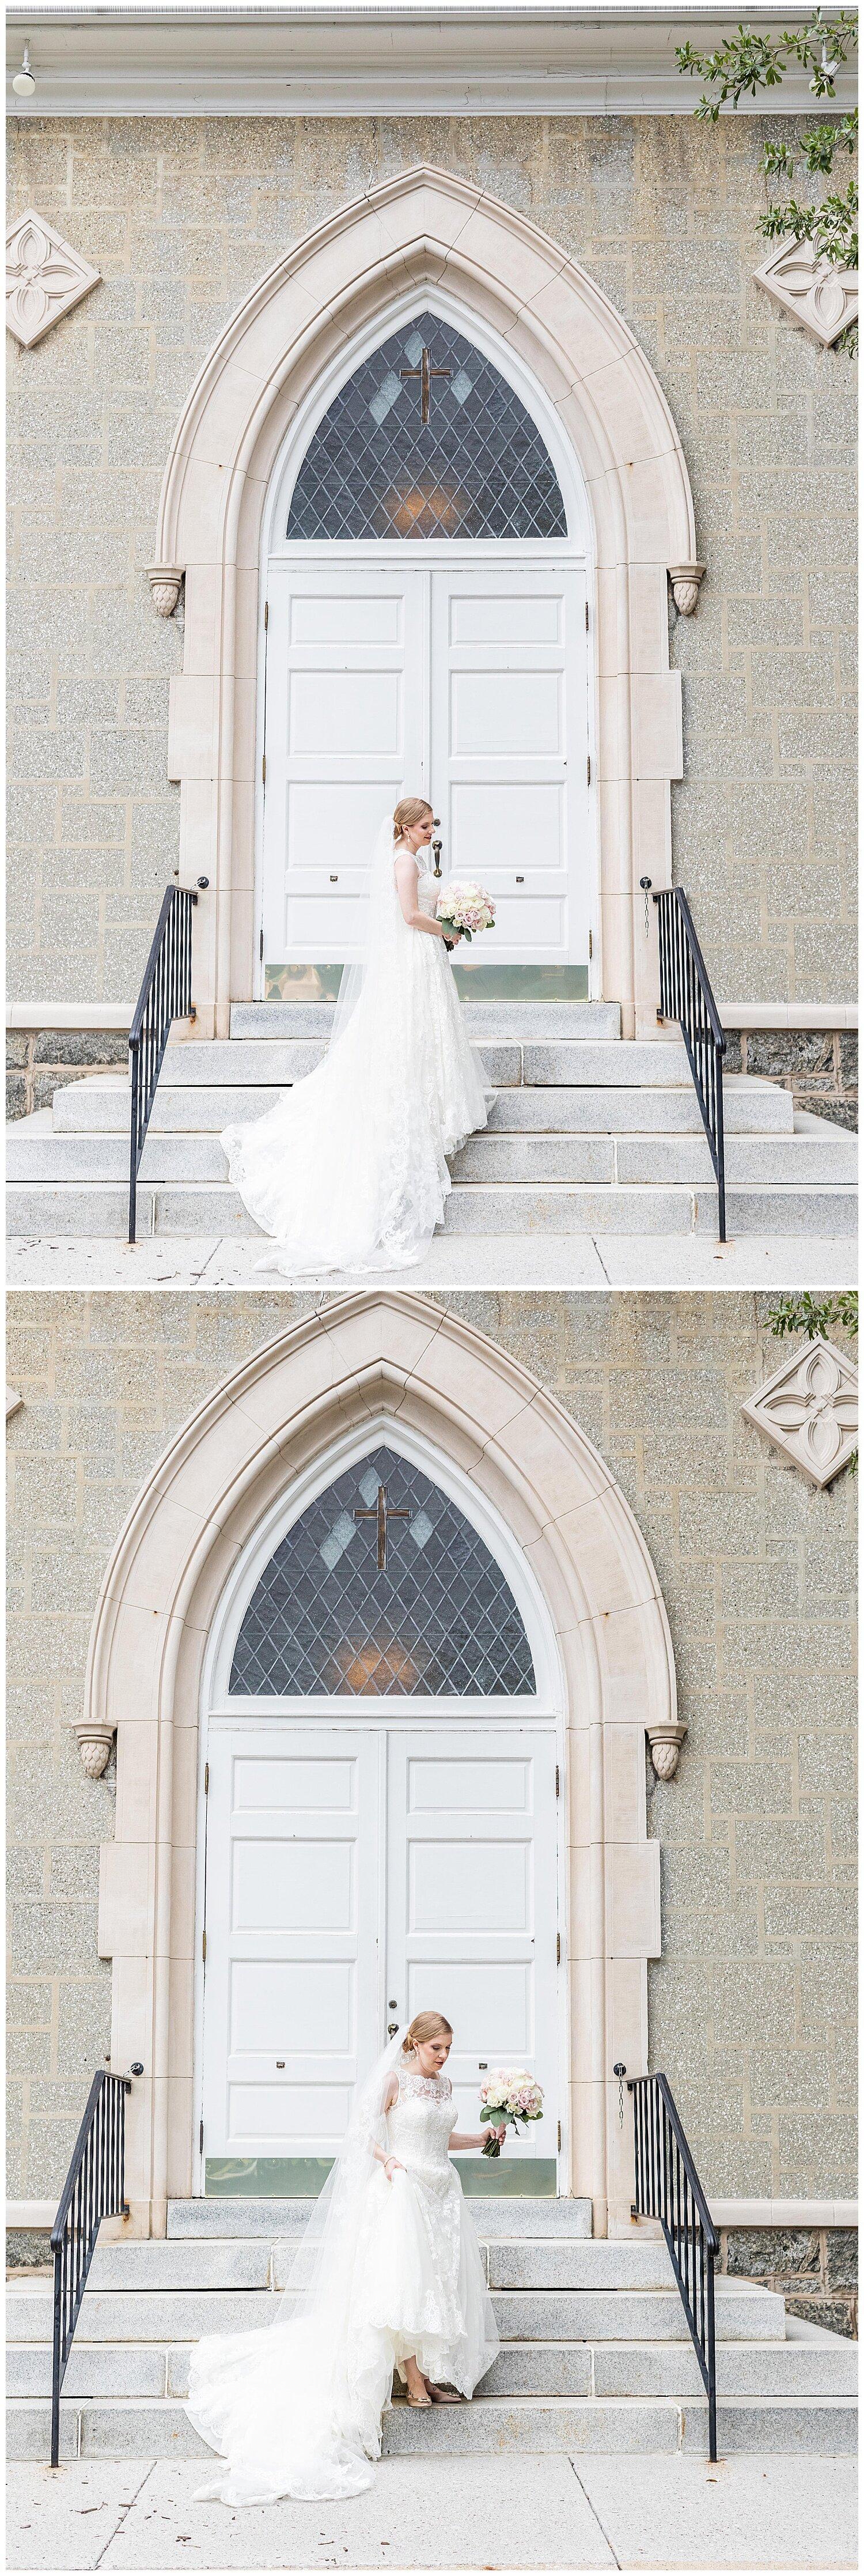 Katie Nick Overhills Mansion Wedding Living Radiant Photography_0033.jpg